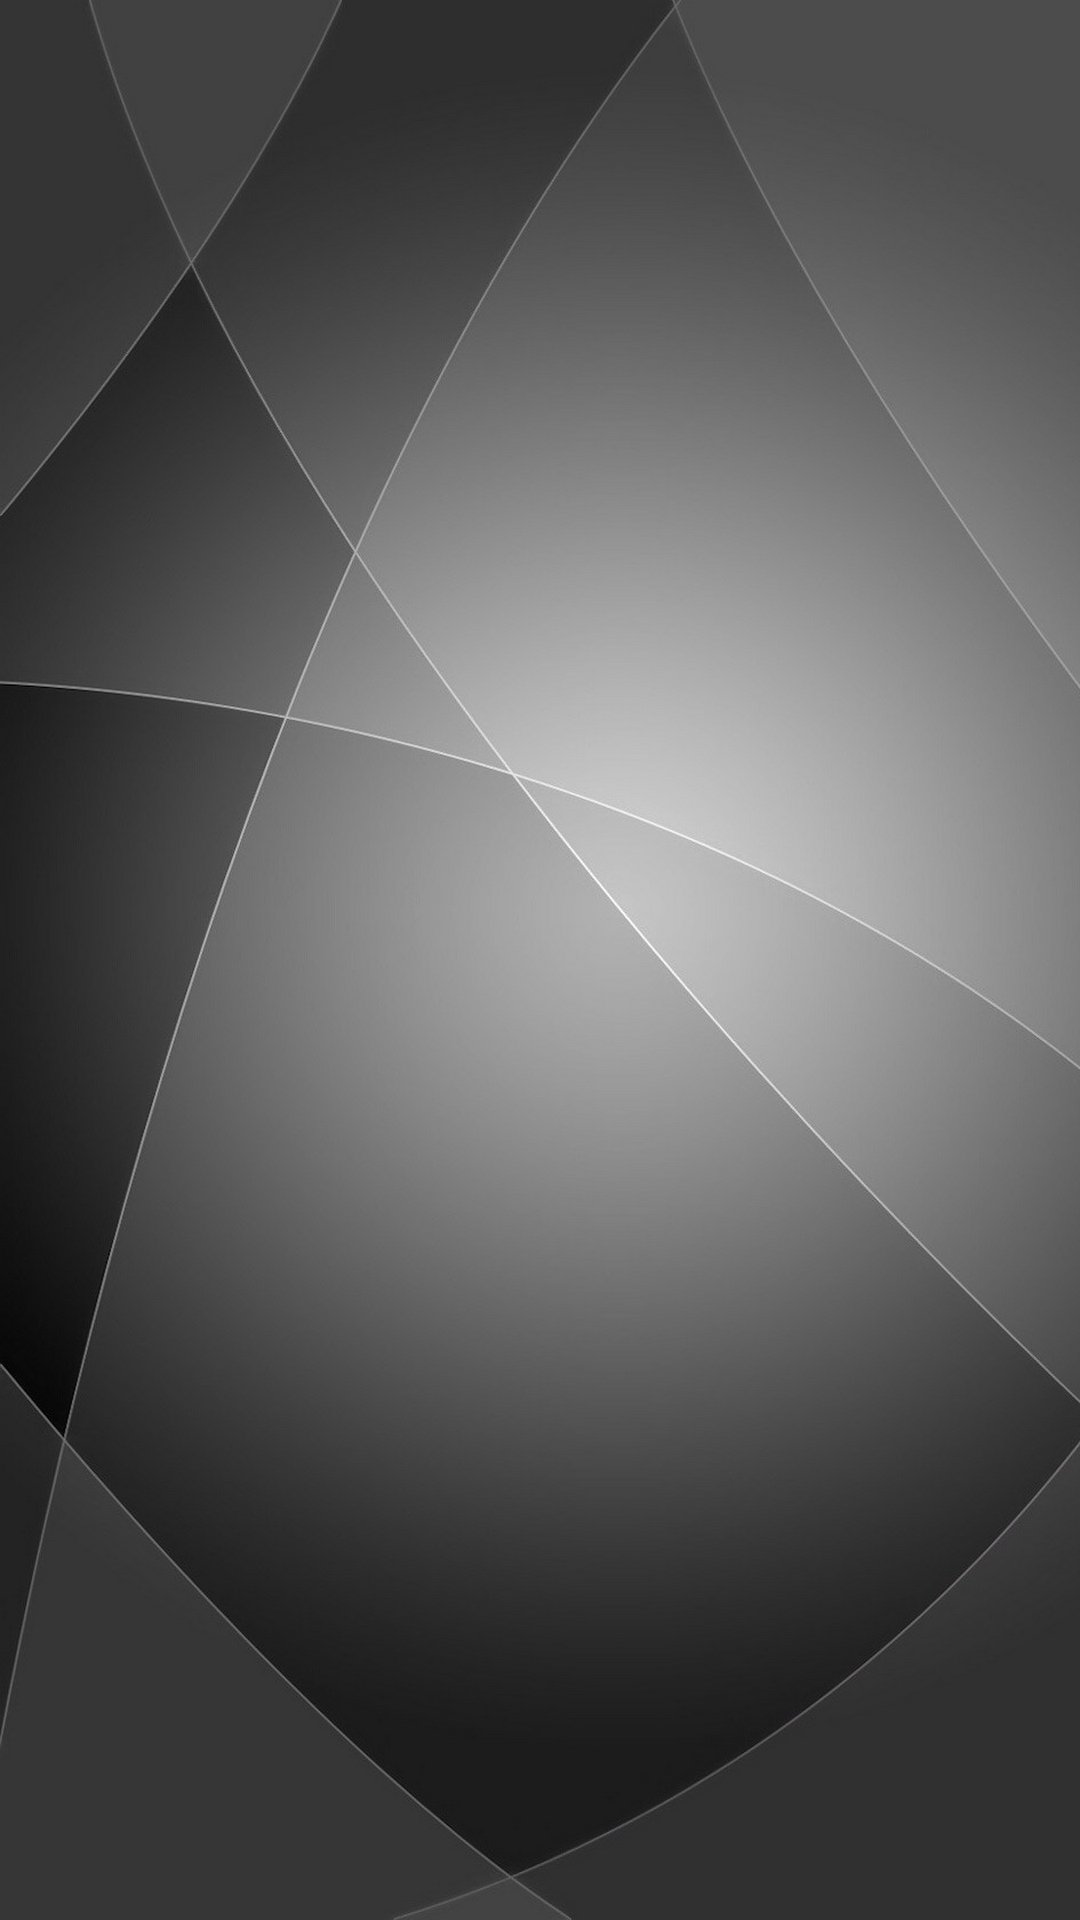 Abstract Gray Light